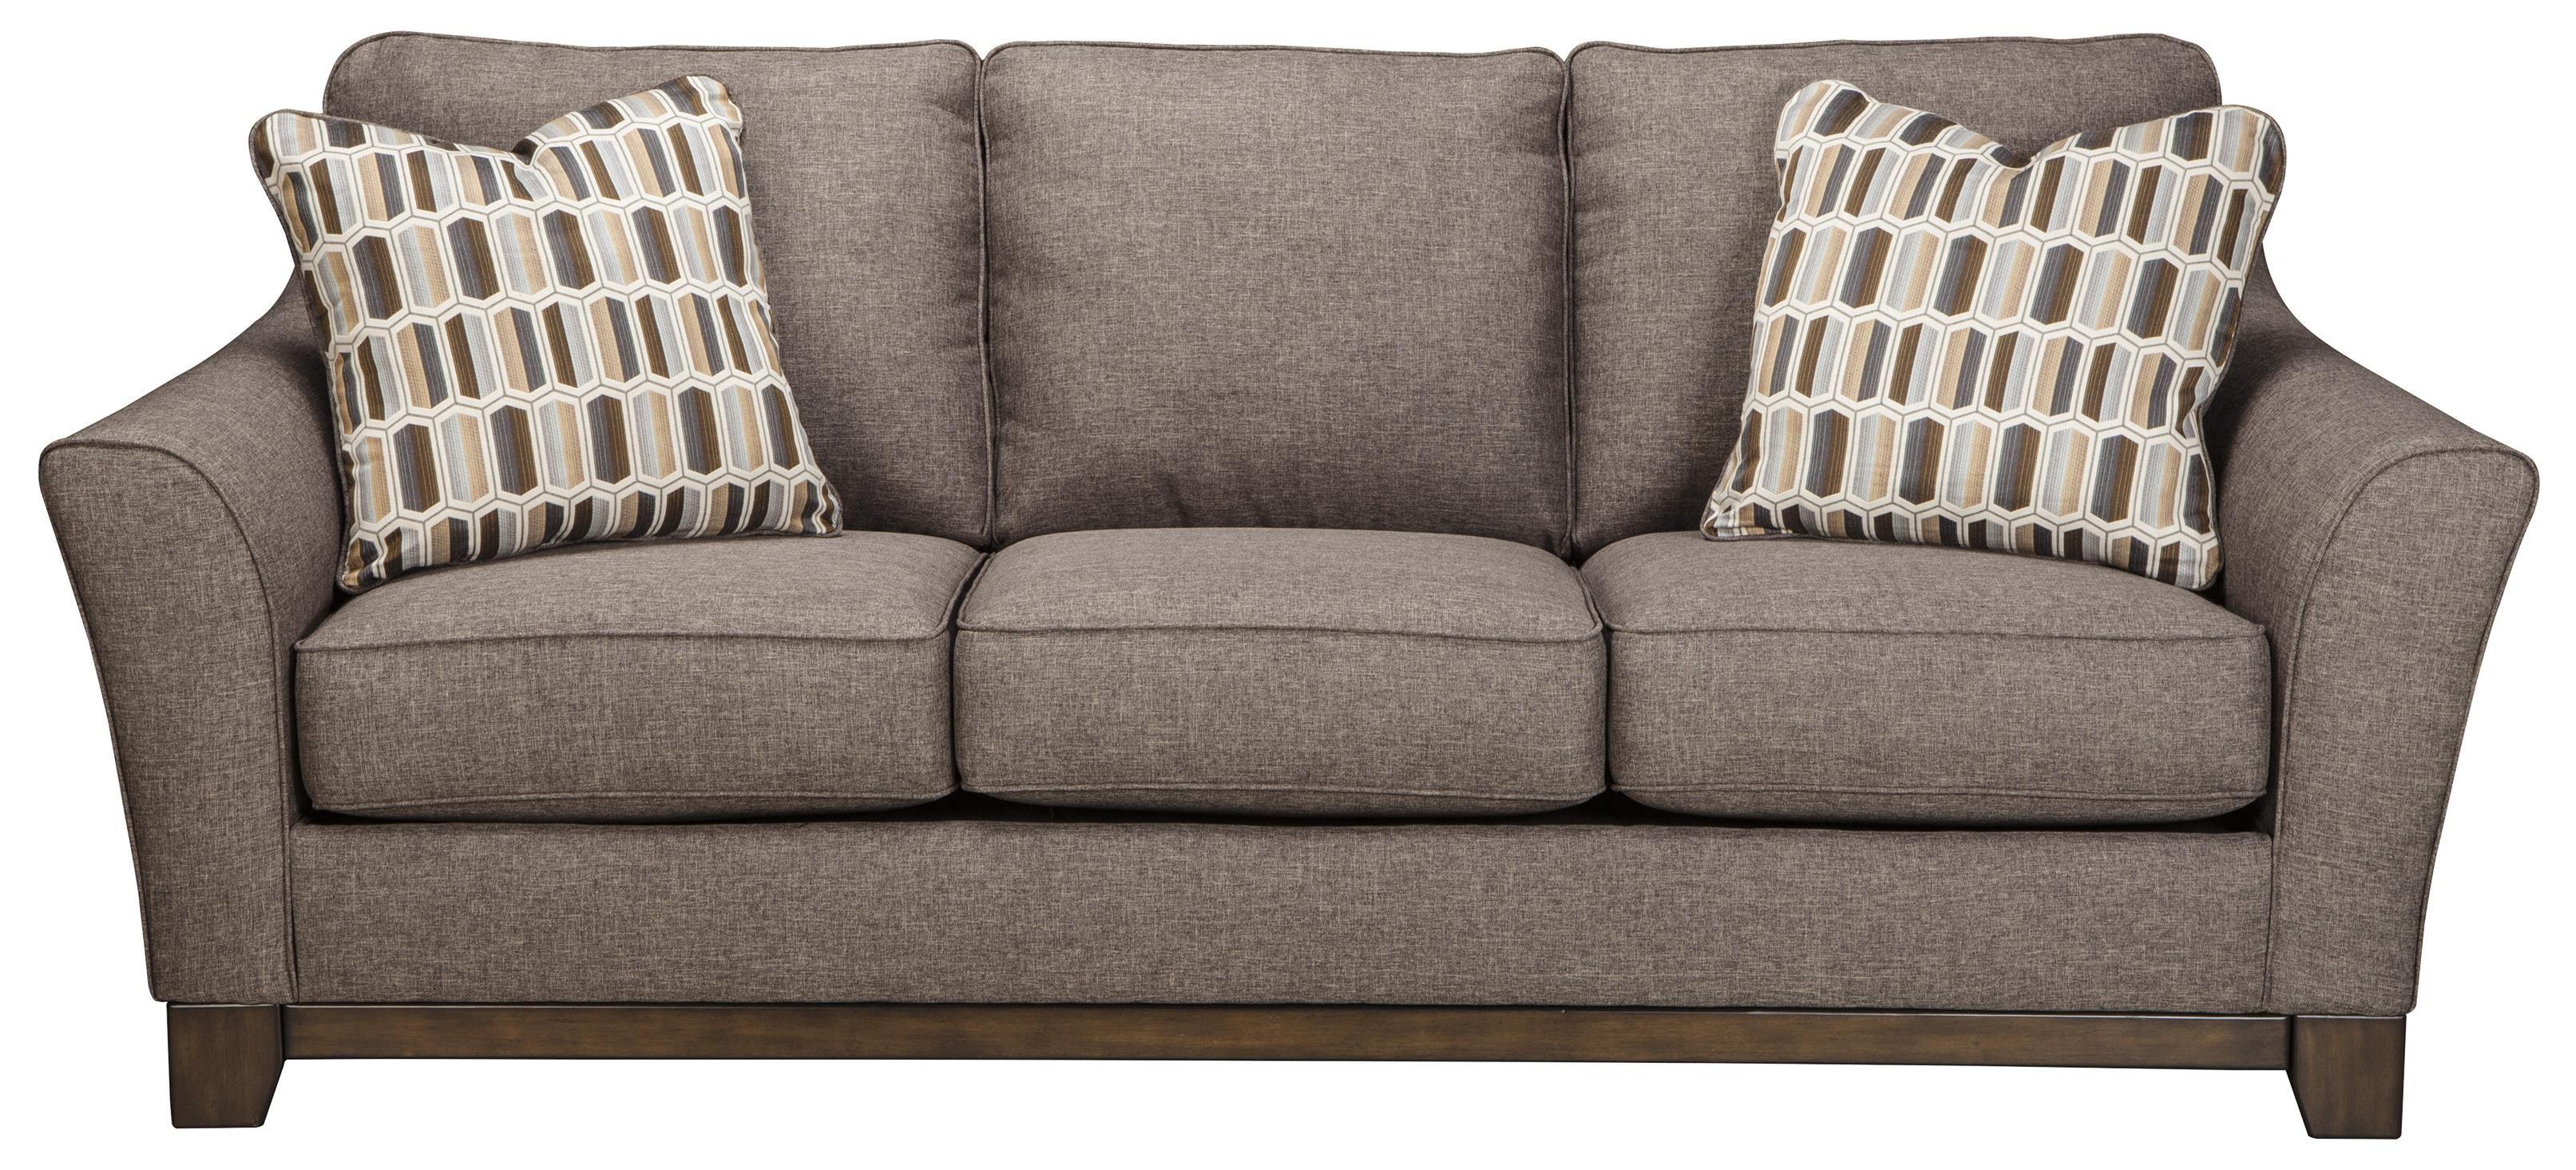 Janley Sofa By Benchcraft Apartment Sofa Ashley Sofa